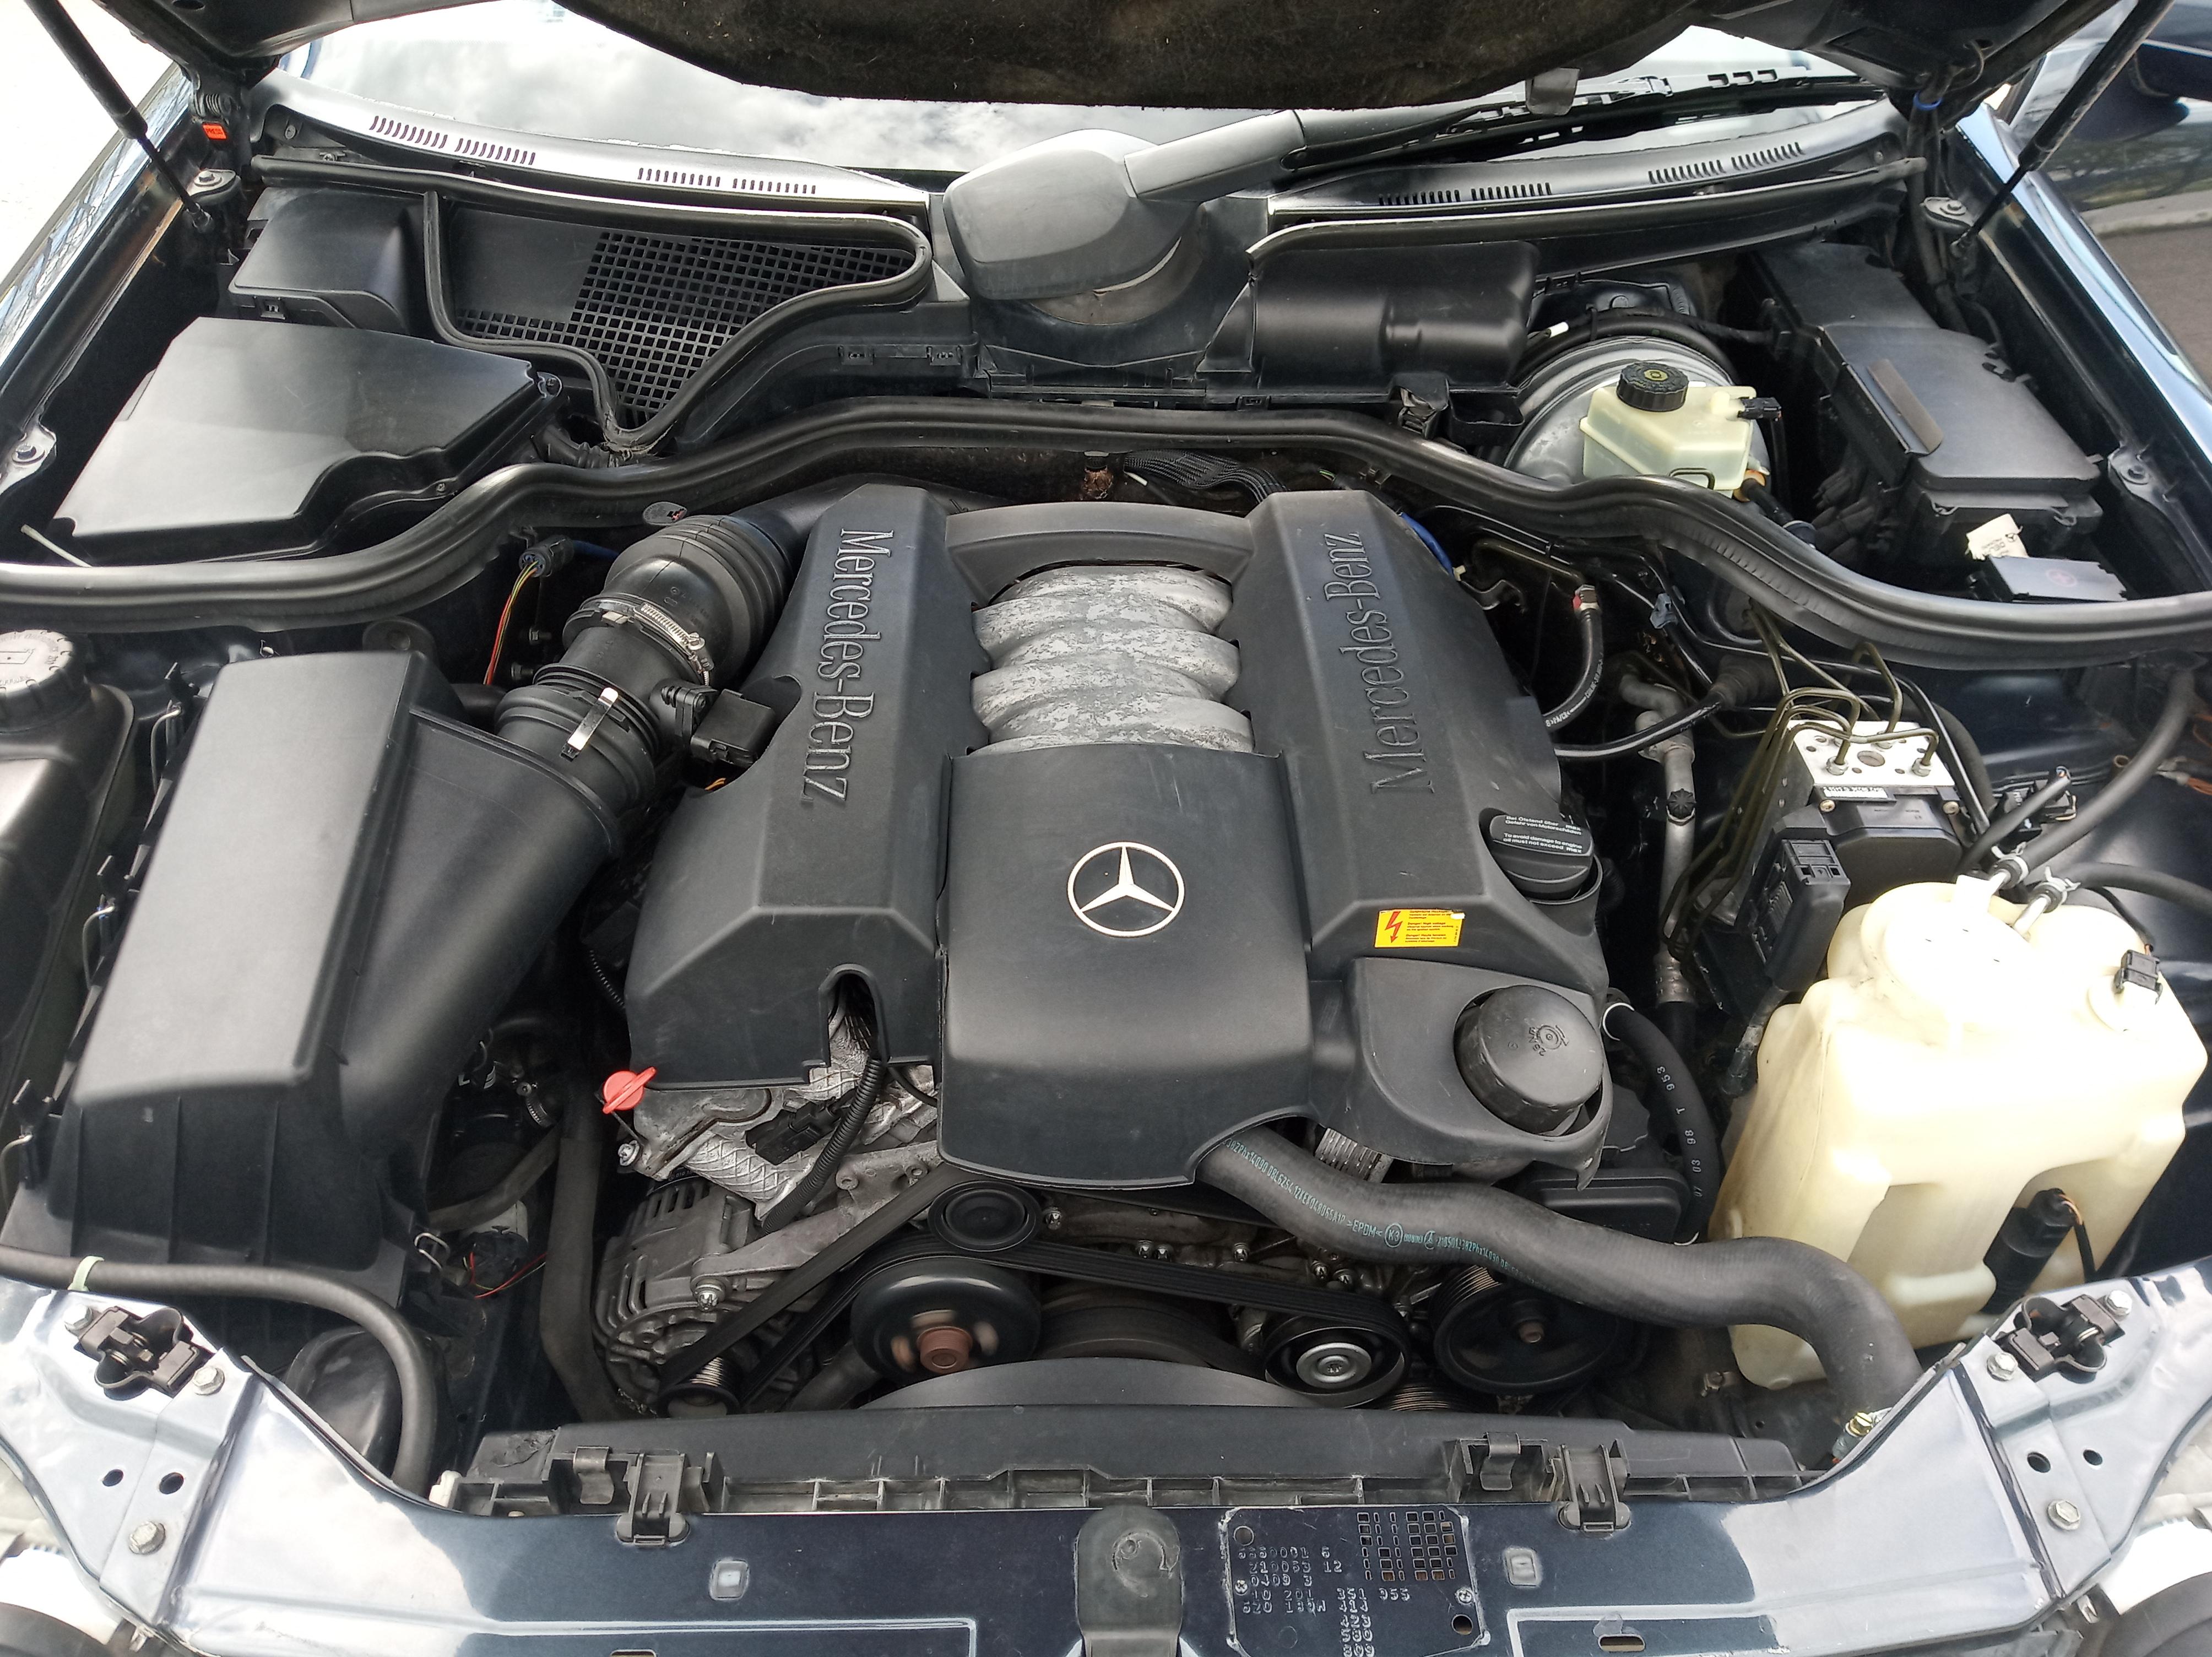 Mercedes-Benz E 280 2.8(lt) 1998 İkinci əl  $11700